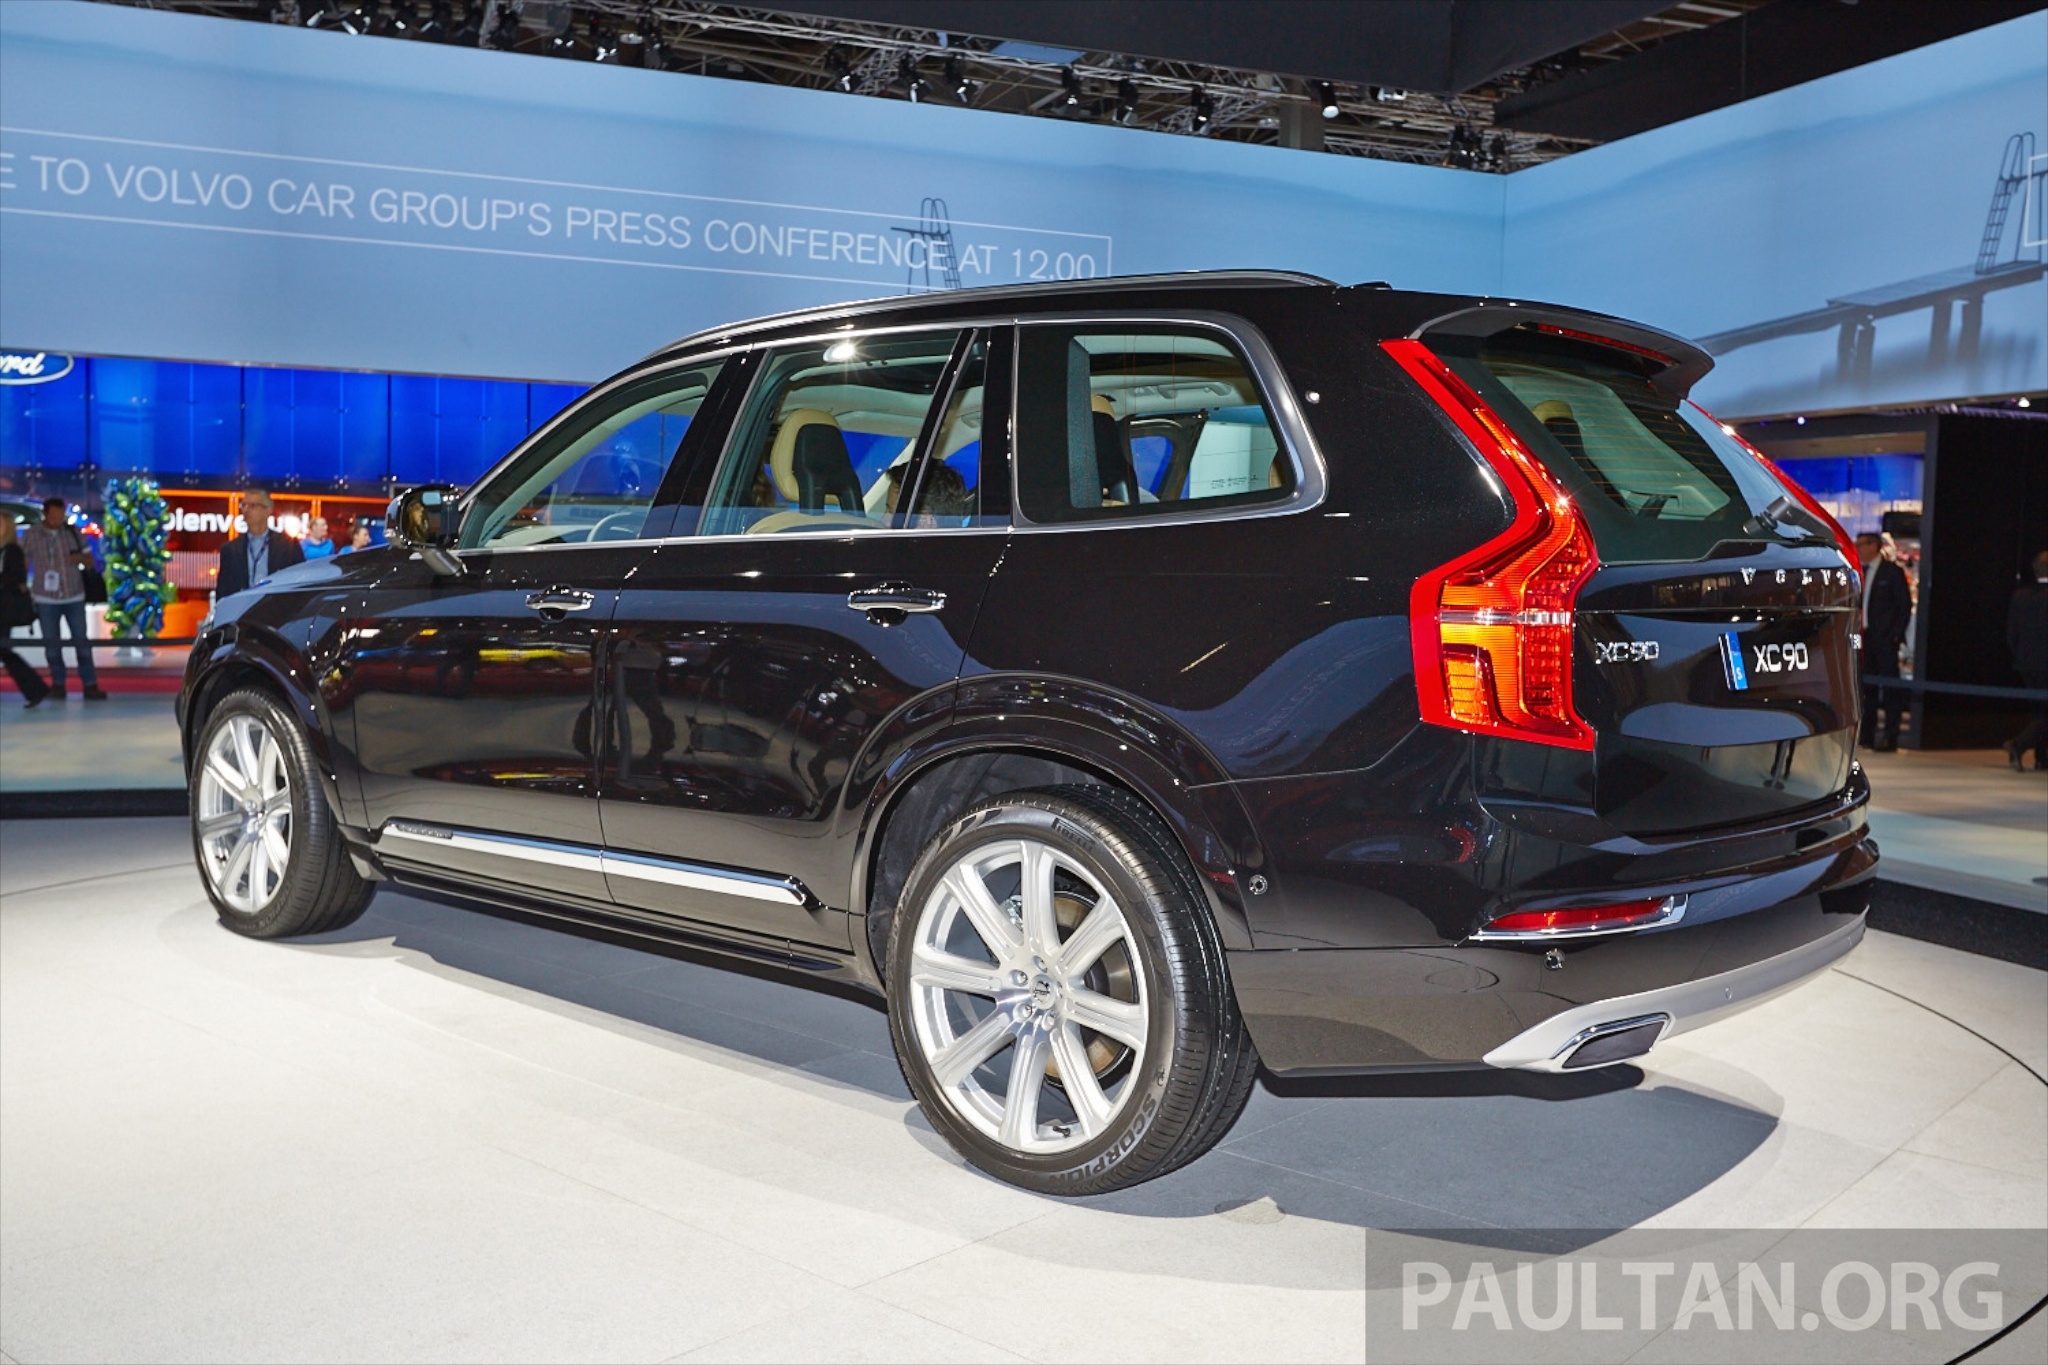 2015 Volvo Xc90 Second Gen 7 Seat Suv Unveiled Image 277769